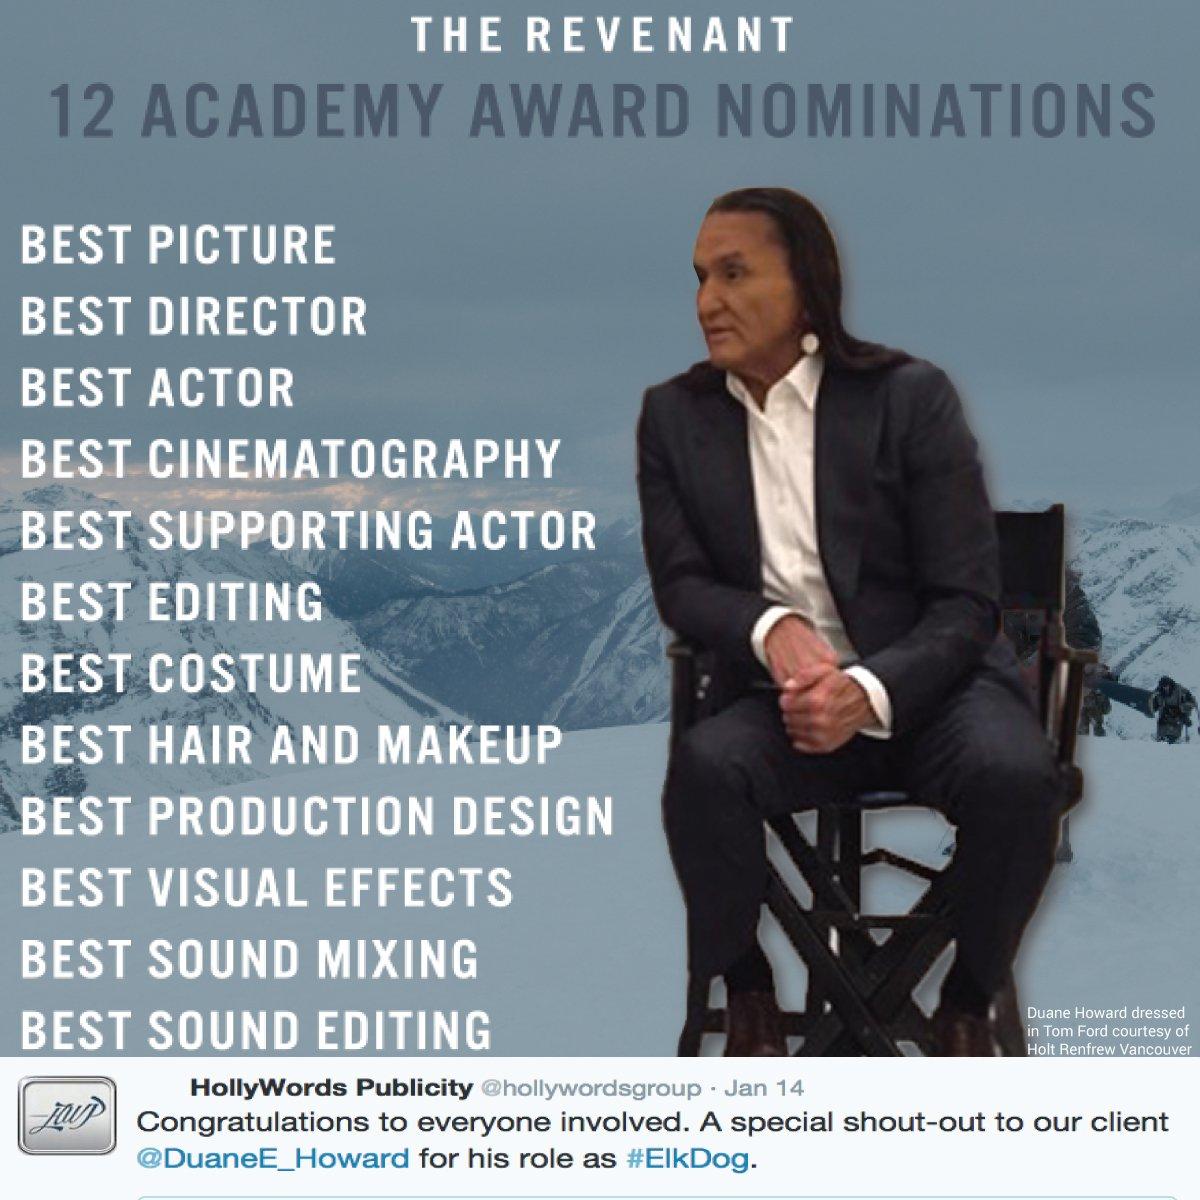 HWP shout-out to client @DuaneE_Howard for his important role in @RevenantMovie's GG wins & 12 Oscar noms. Bravo! https://t.co/kznMjU7qW0